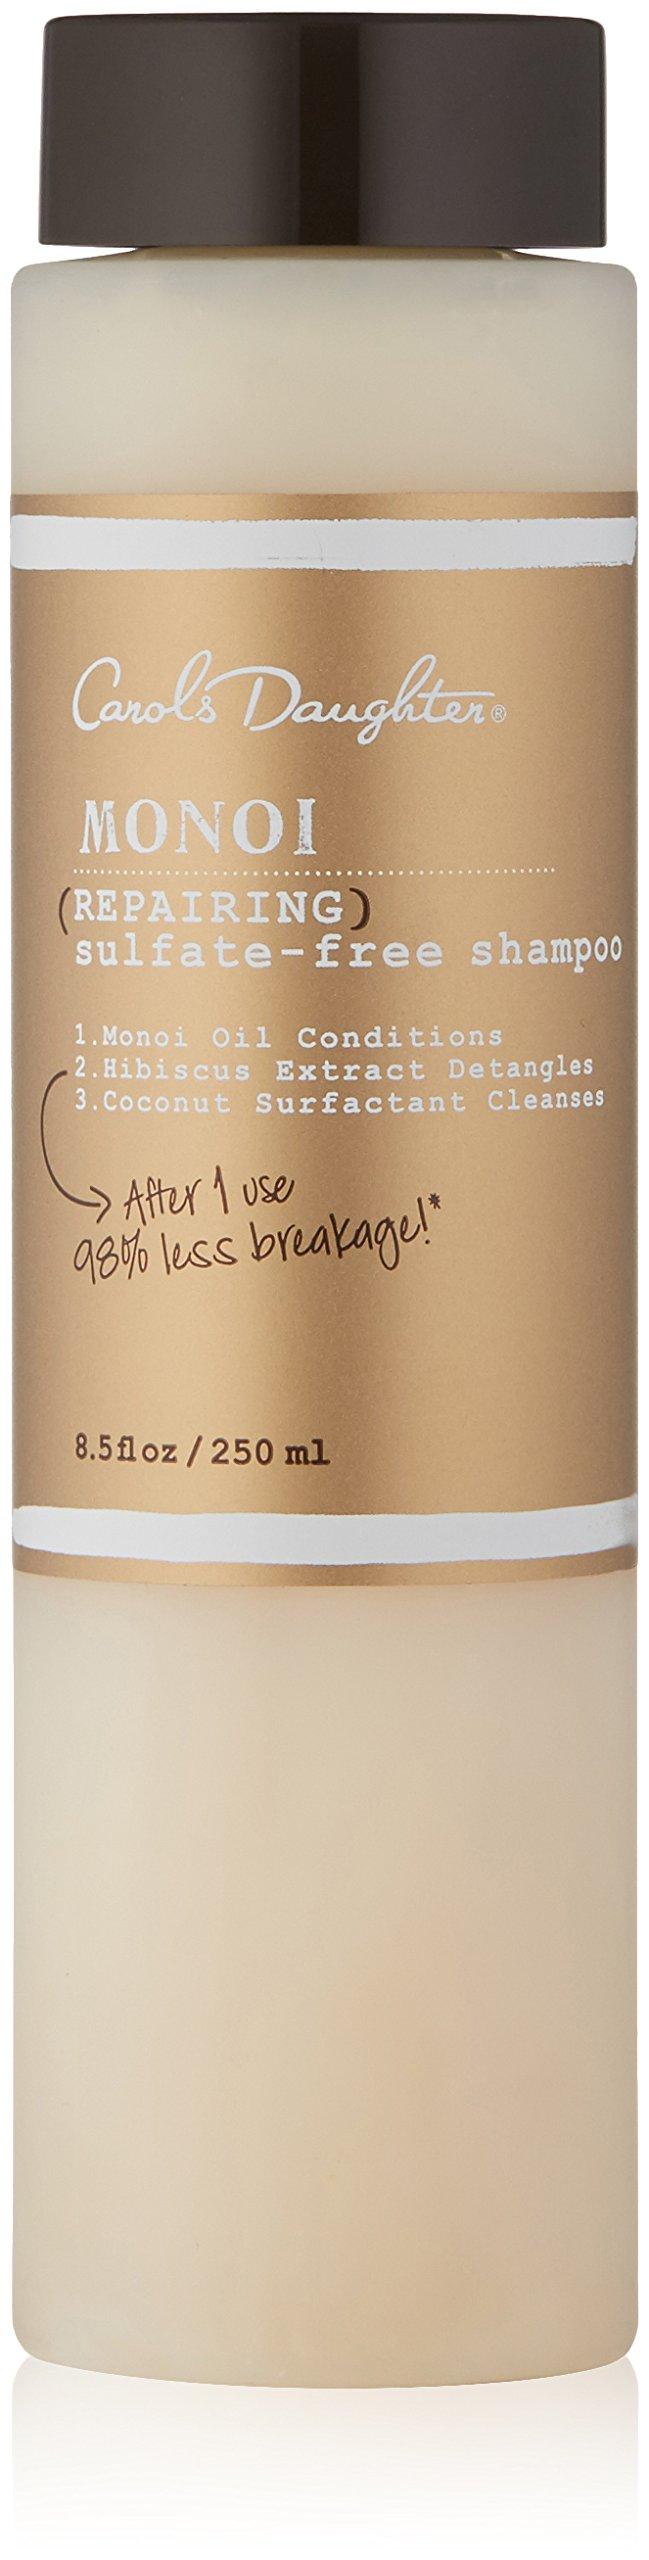 Carol's Daughter Monoi Sulfate-free Shampoo, 8.5 oz